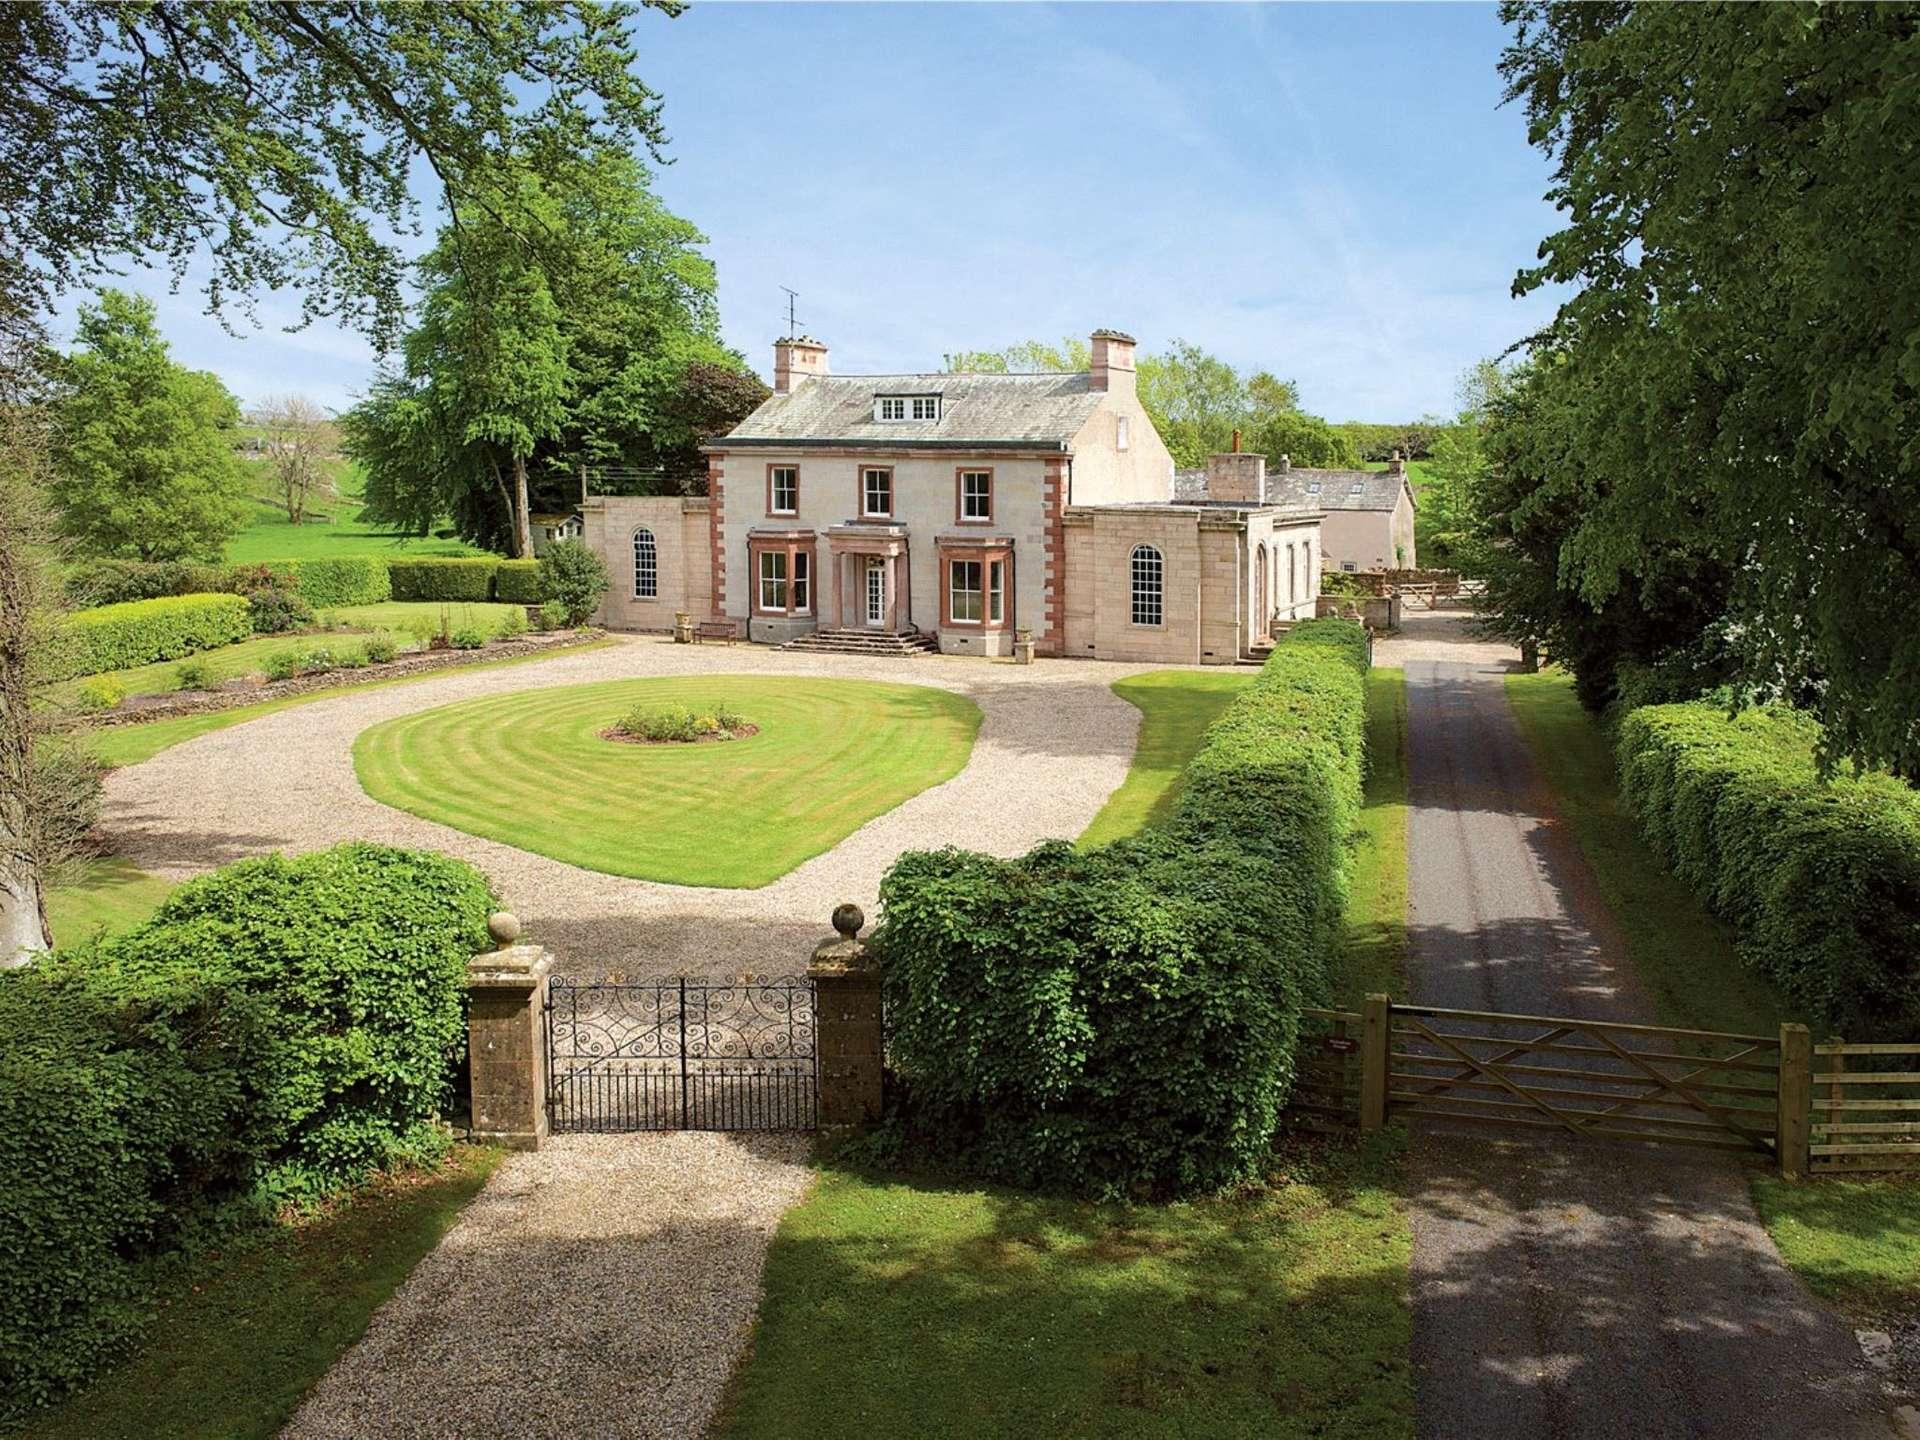 Maulds Meaburn, Penrith, Cumbria, CA10 3HX   Property for sale - Savills